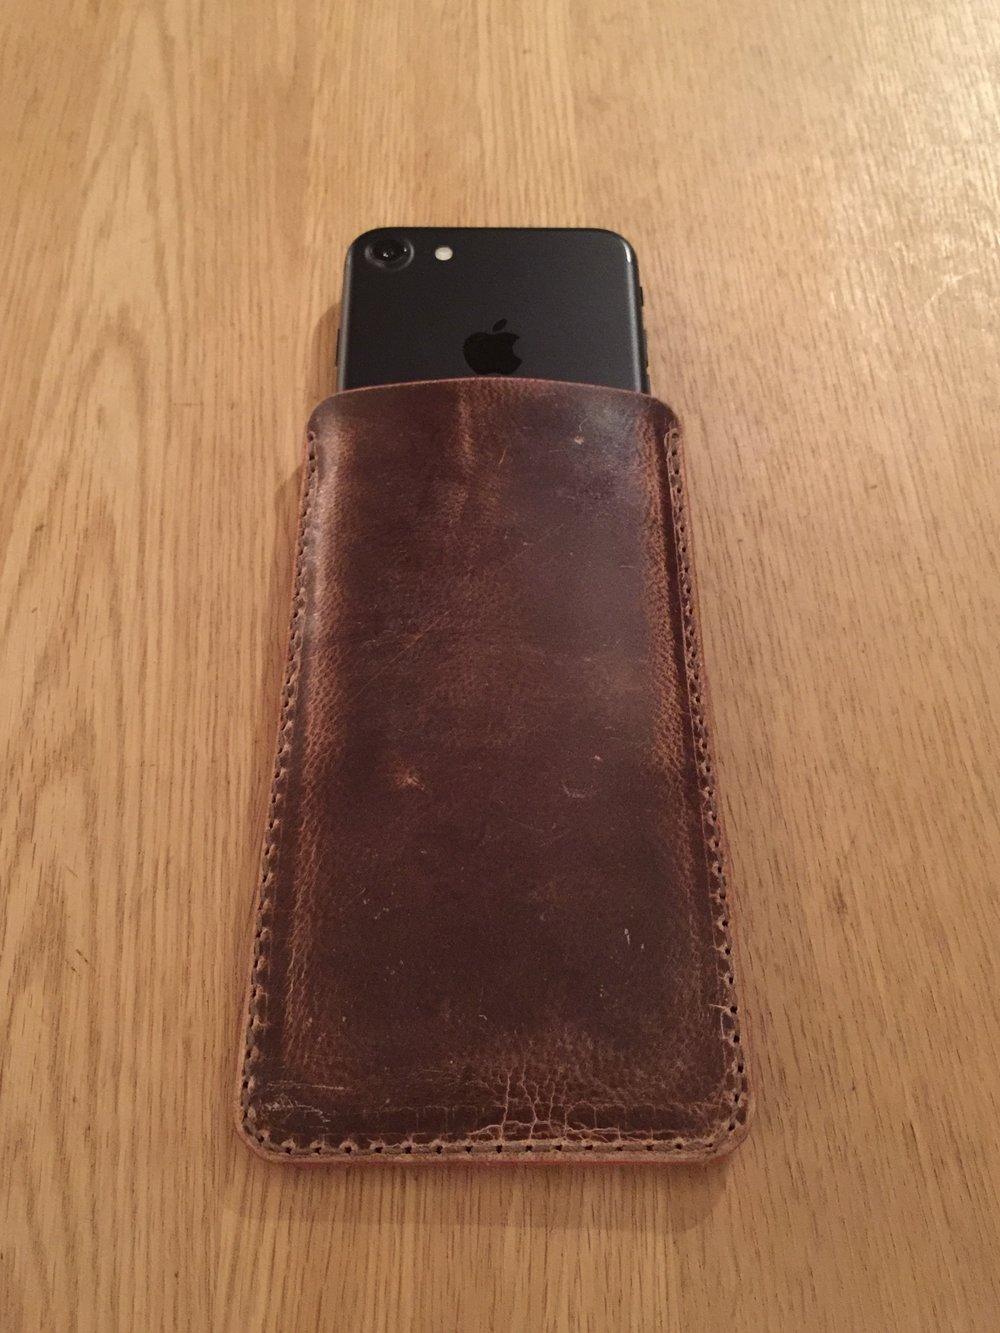 Casual snob - Ryan London Case Iphone 7 - 8.jpg